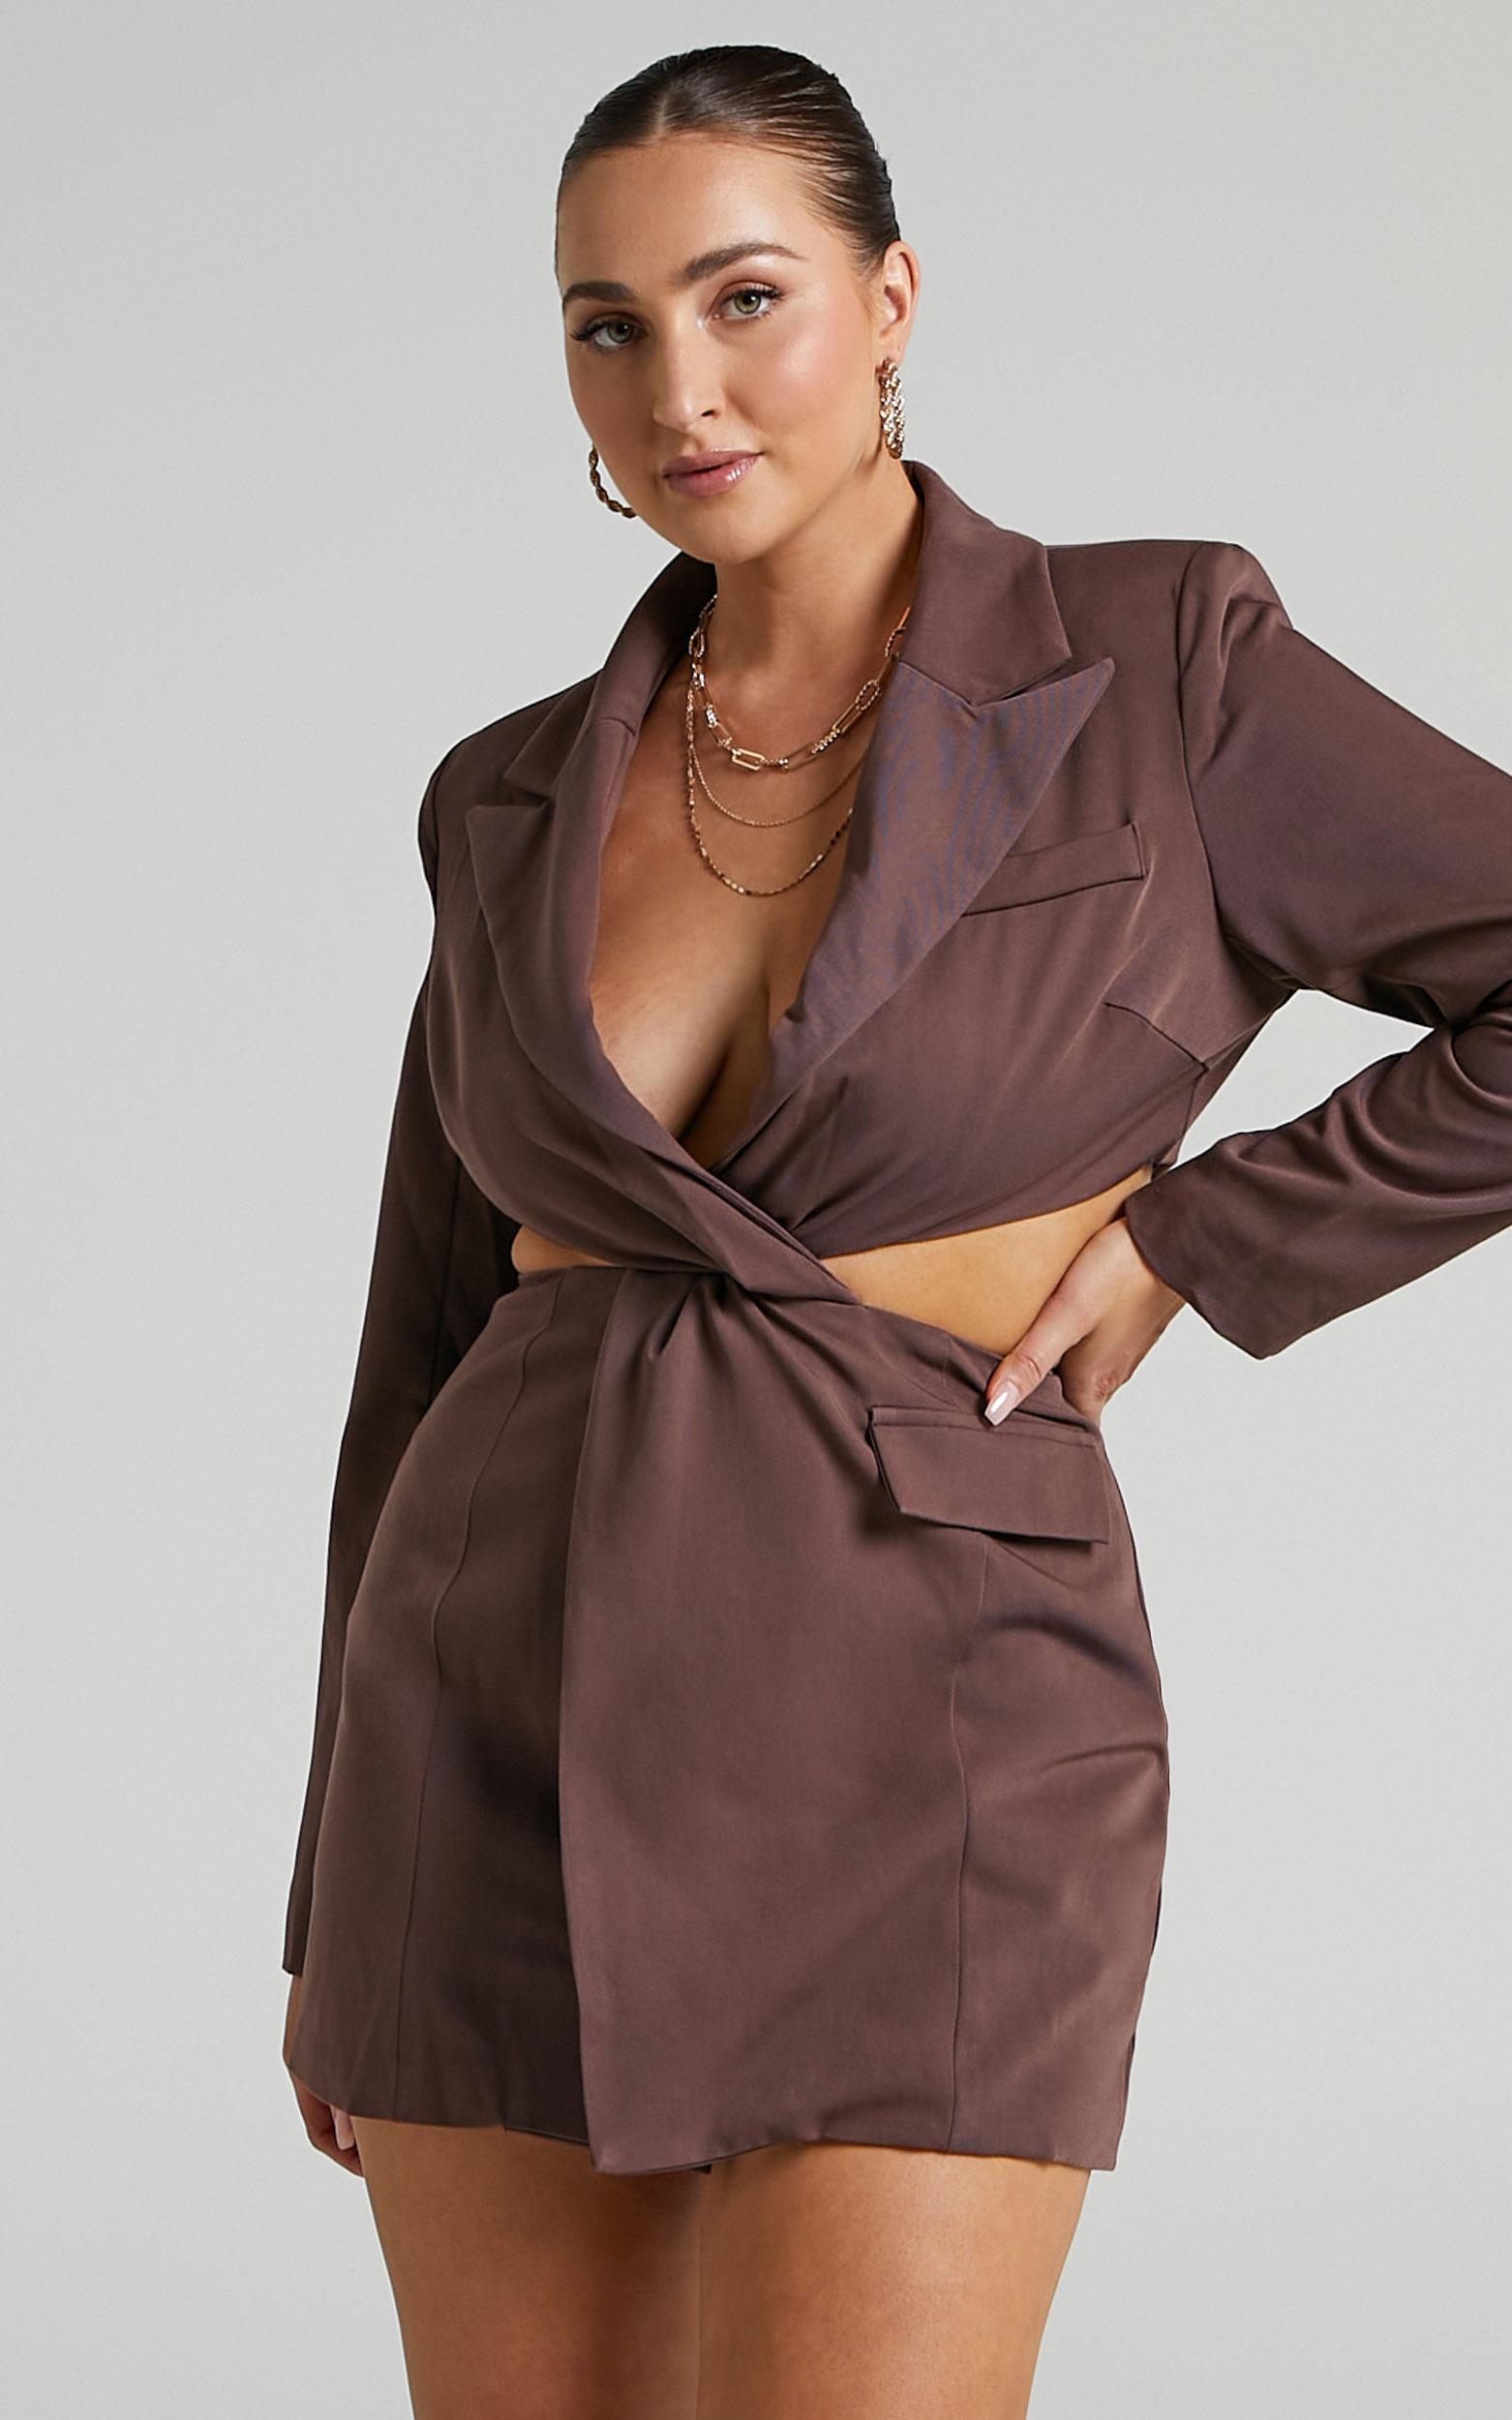 Amina Blazer Dress in Chocolate - 06, BRN3, hi-res image number null